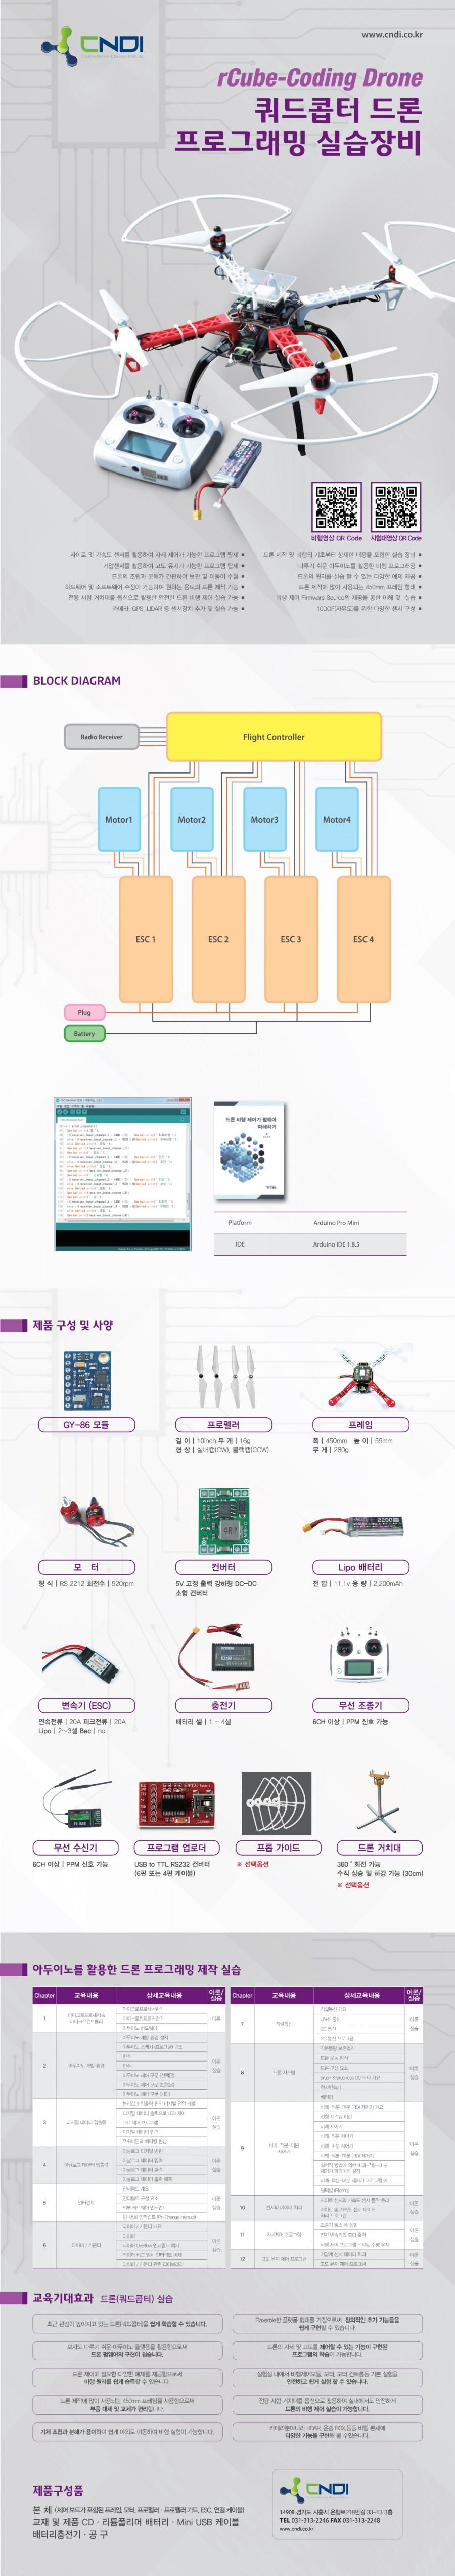 rCube-Coding+Drone.jpg